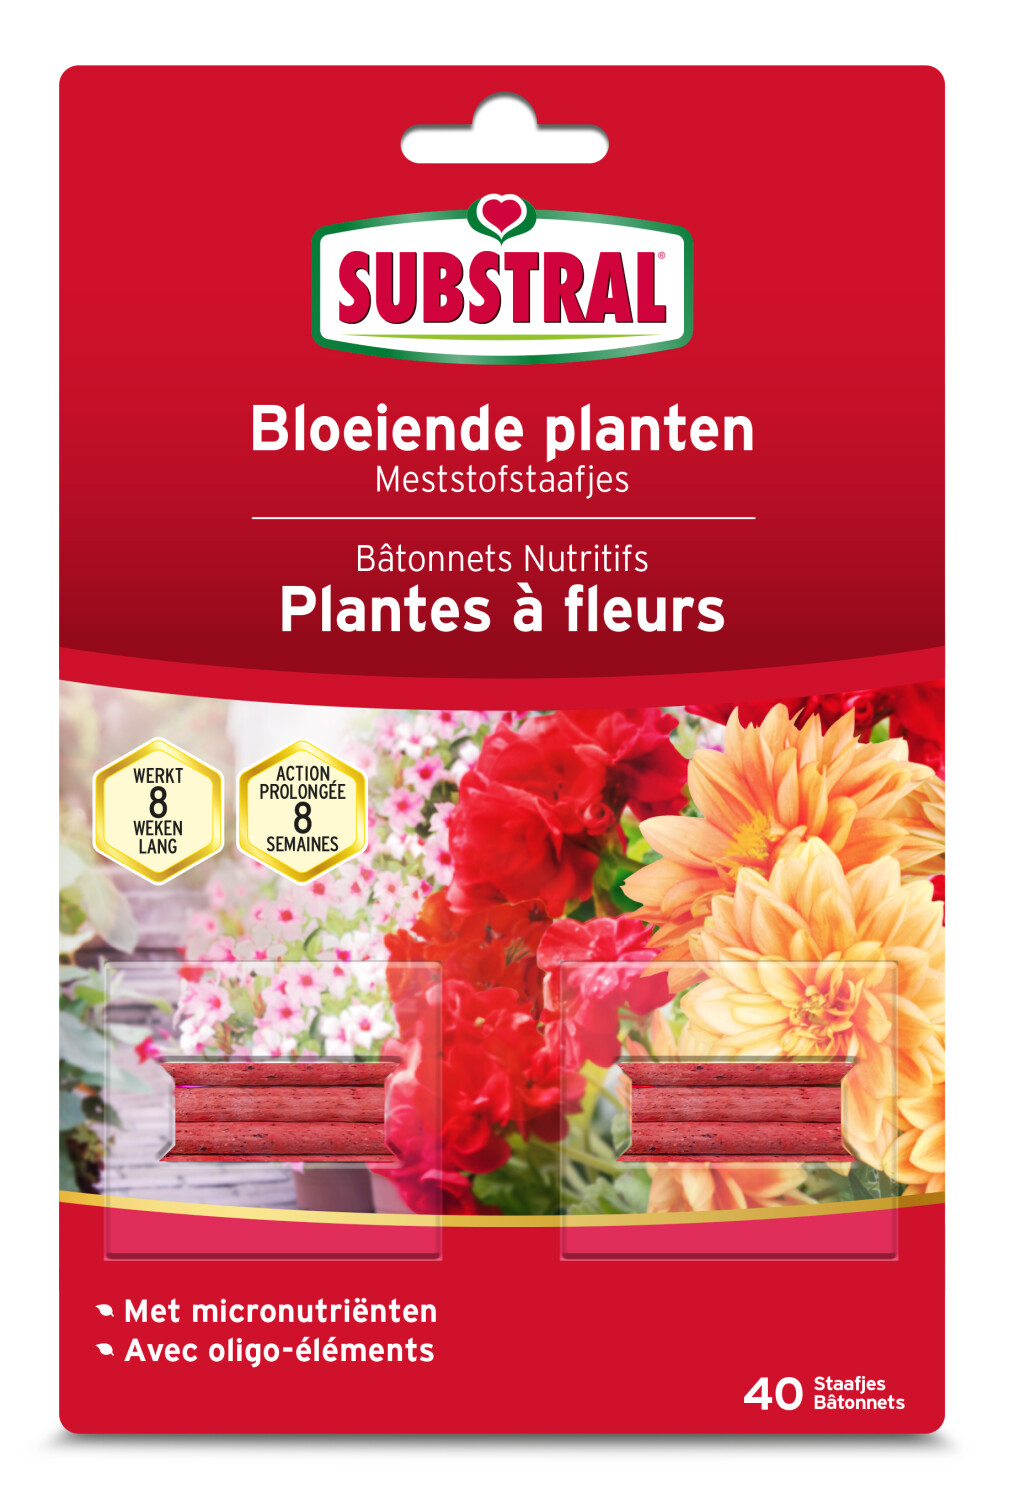 Meststofstaafjes Substral bloeiende planten